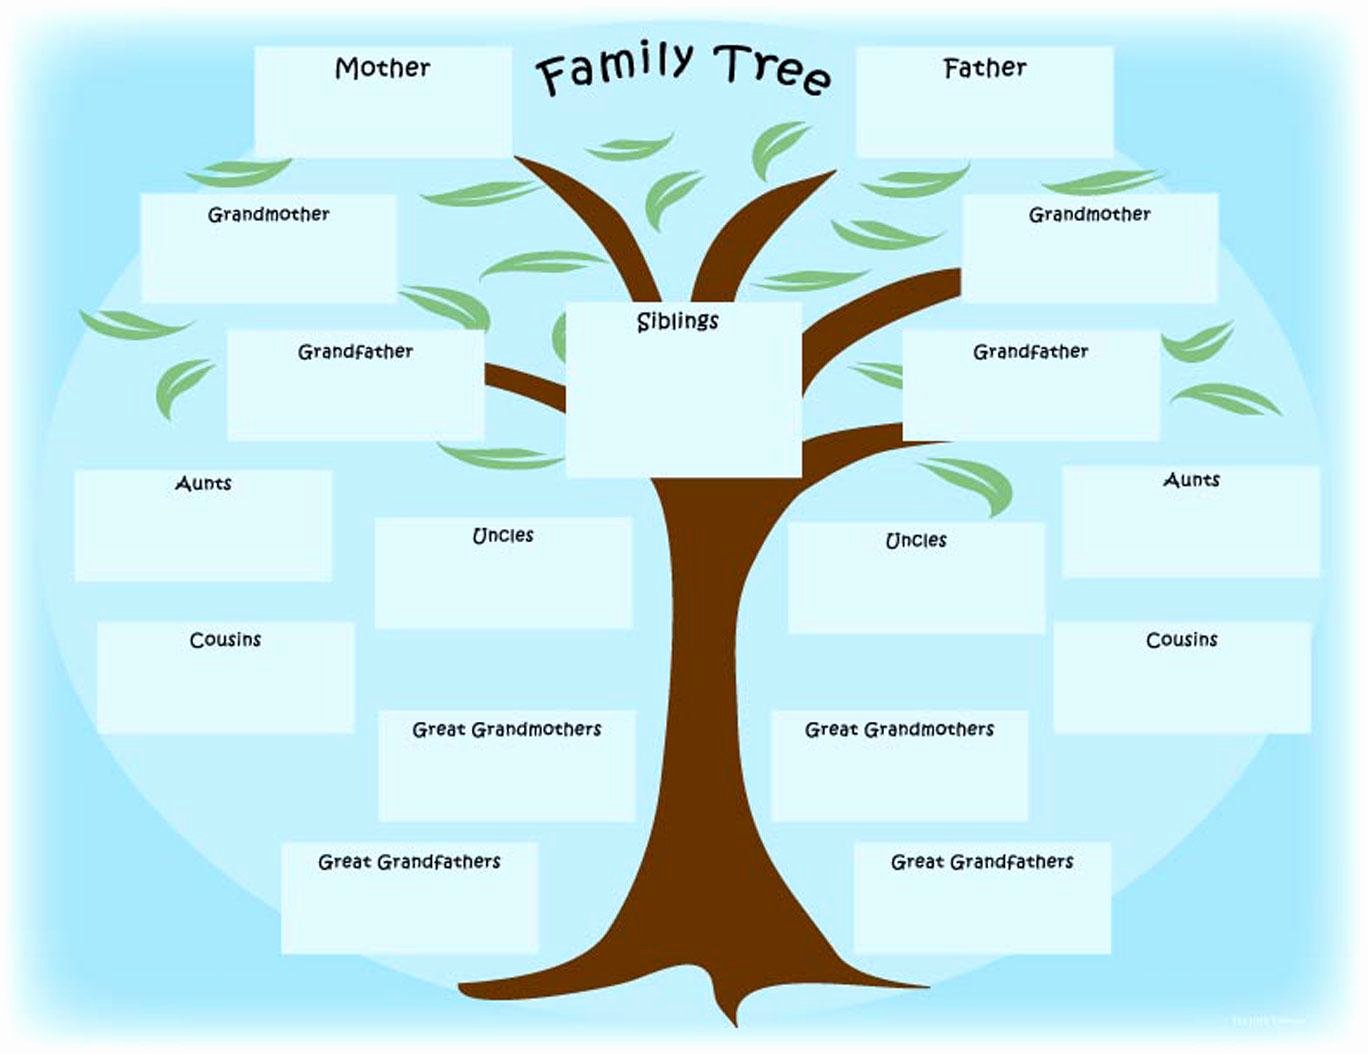 Family Tree Template Free Elegant 15 Free Family Tree Template Chart & Diagram In Pdf